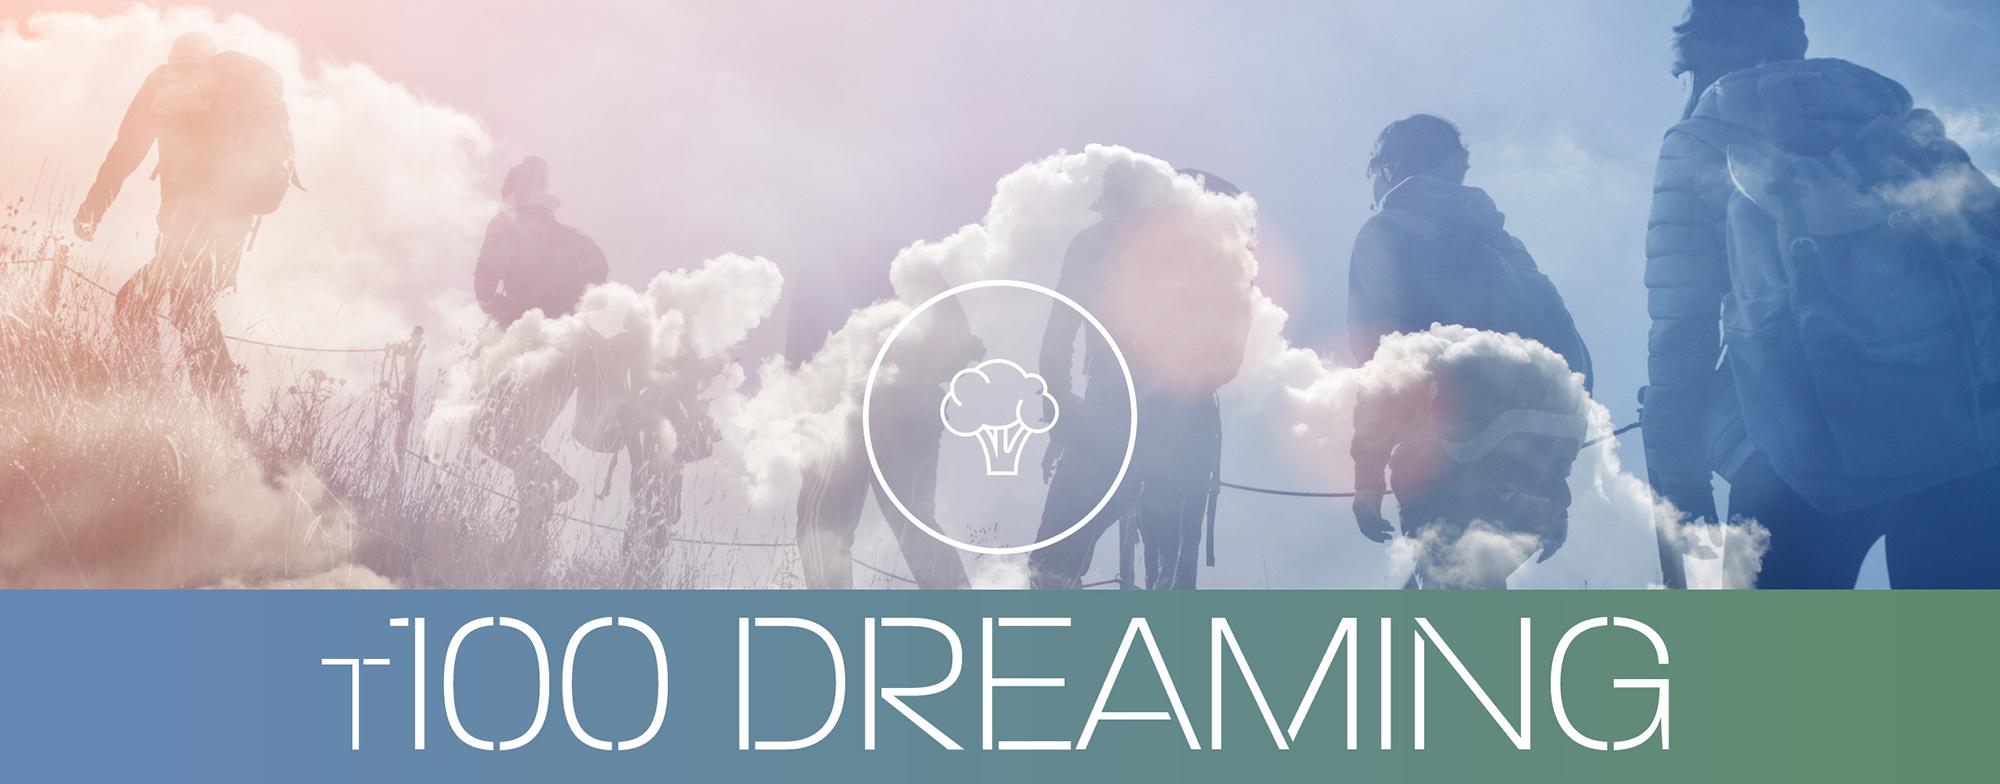 T100 Dreaming Purfleet walk header image